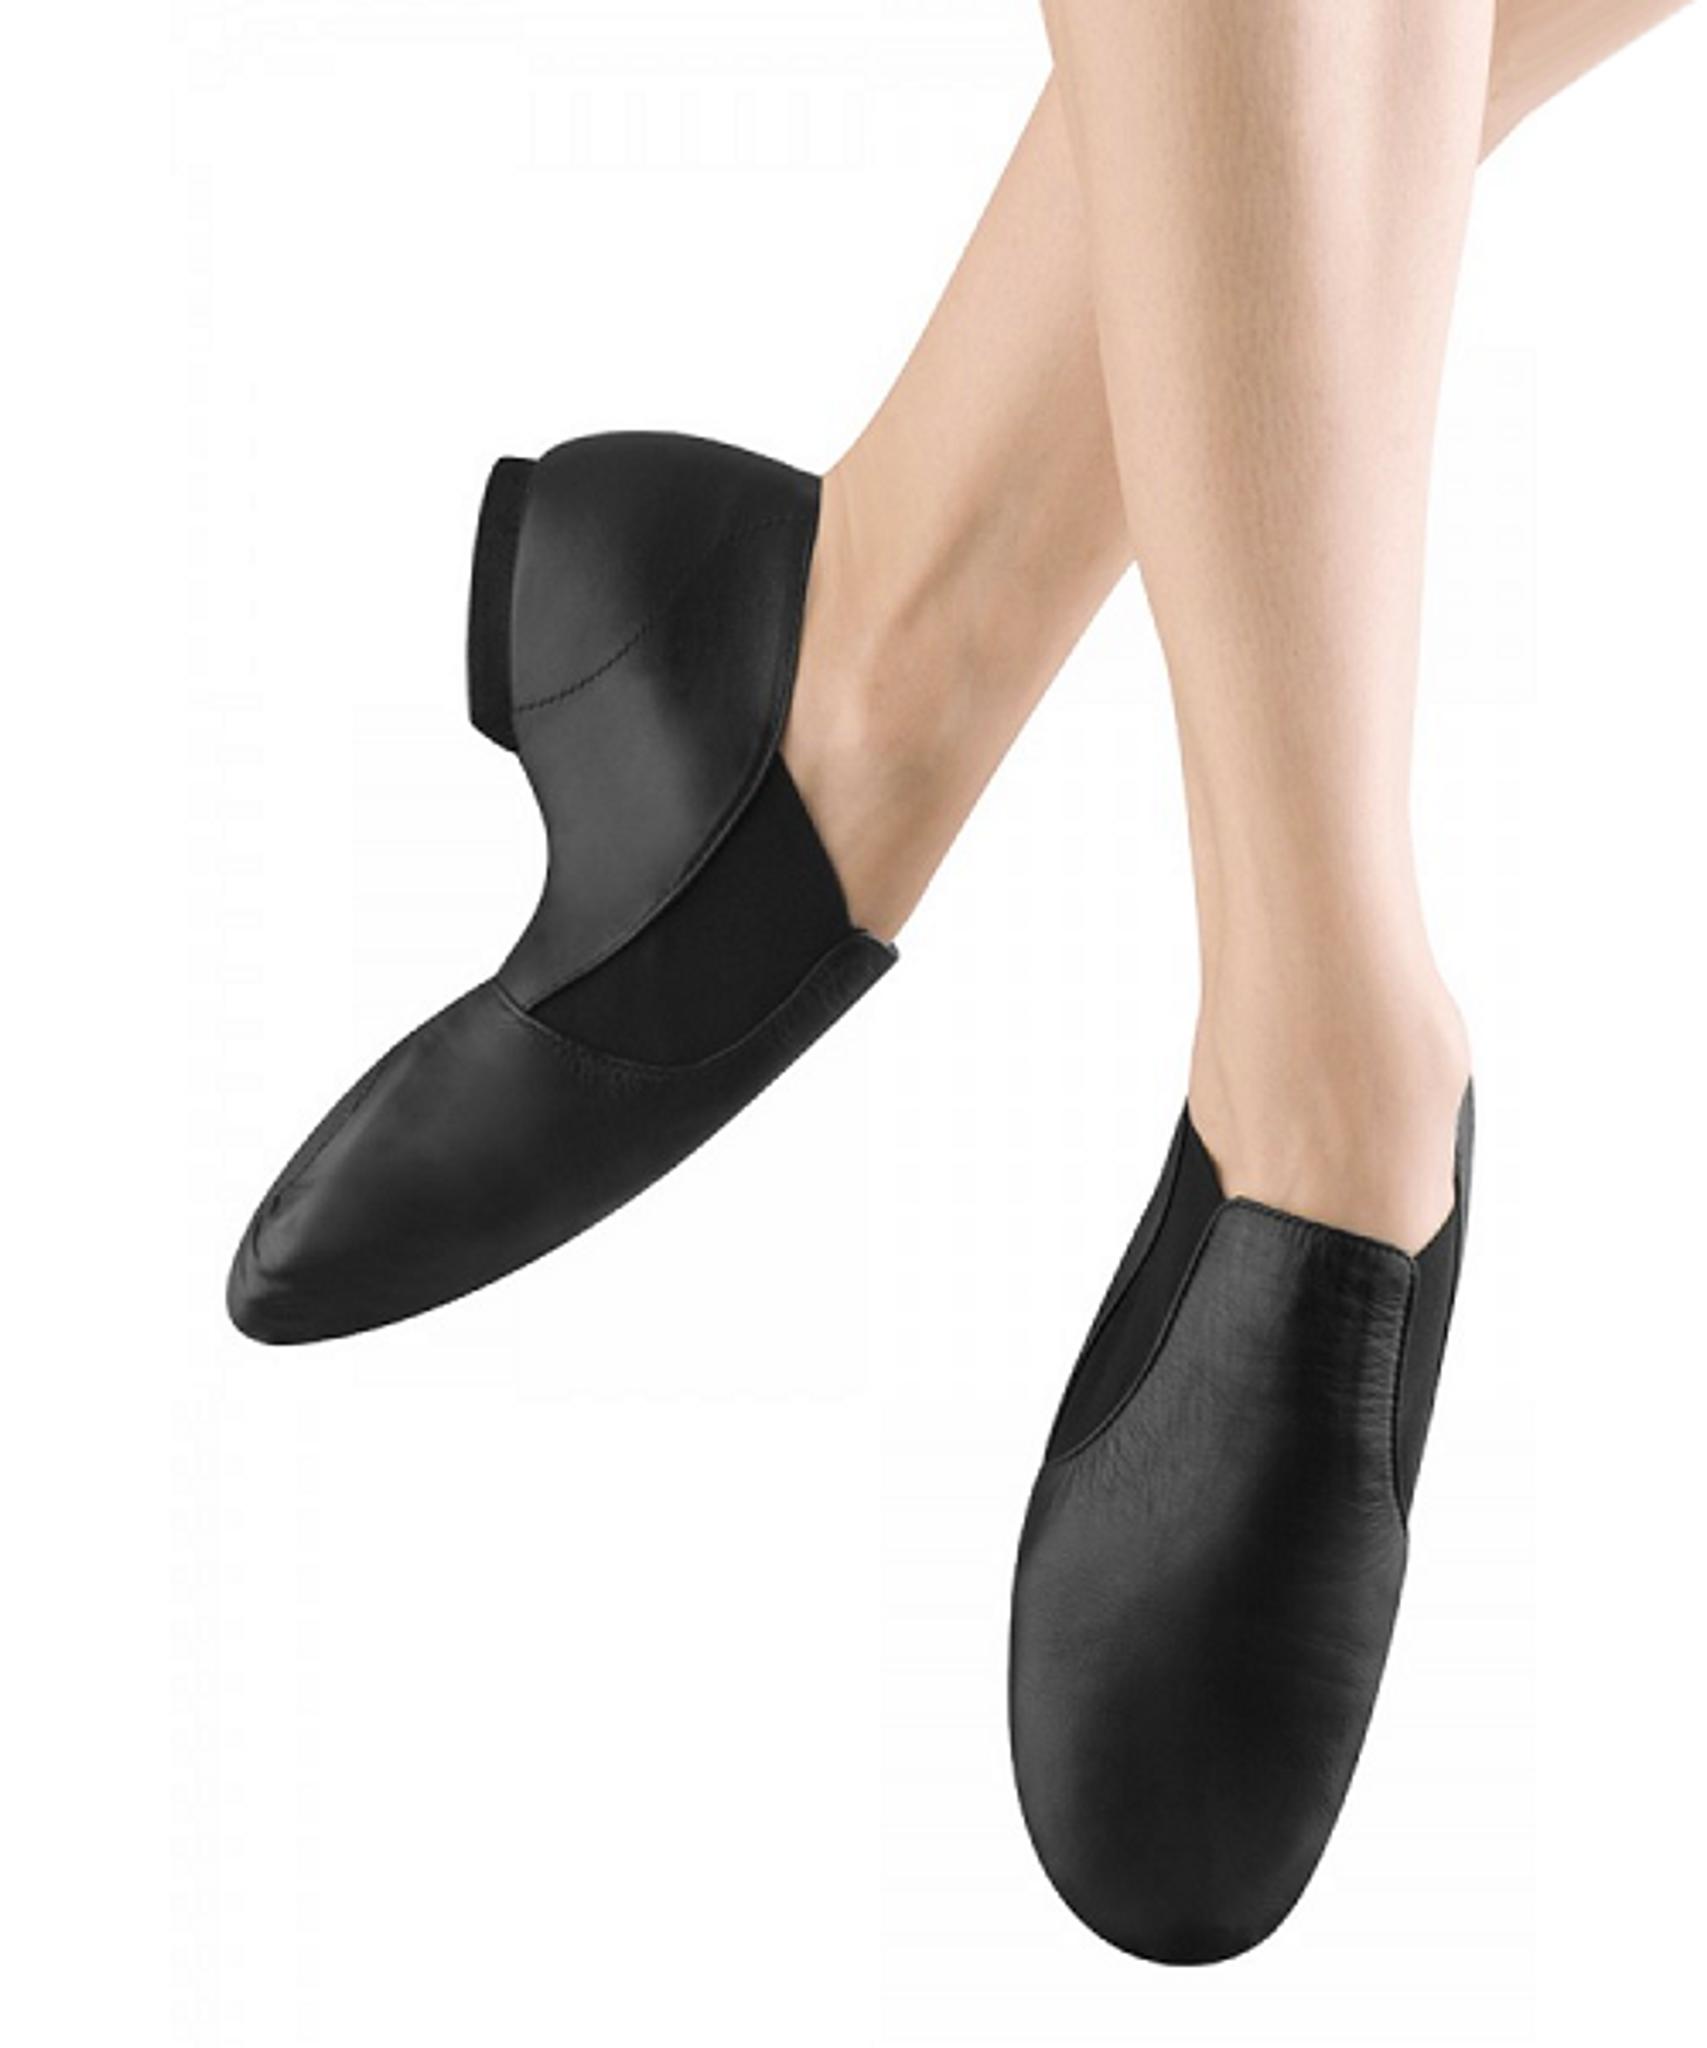 Elasta Bootie Slip On Jazz Shoes - Black